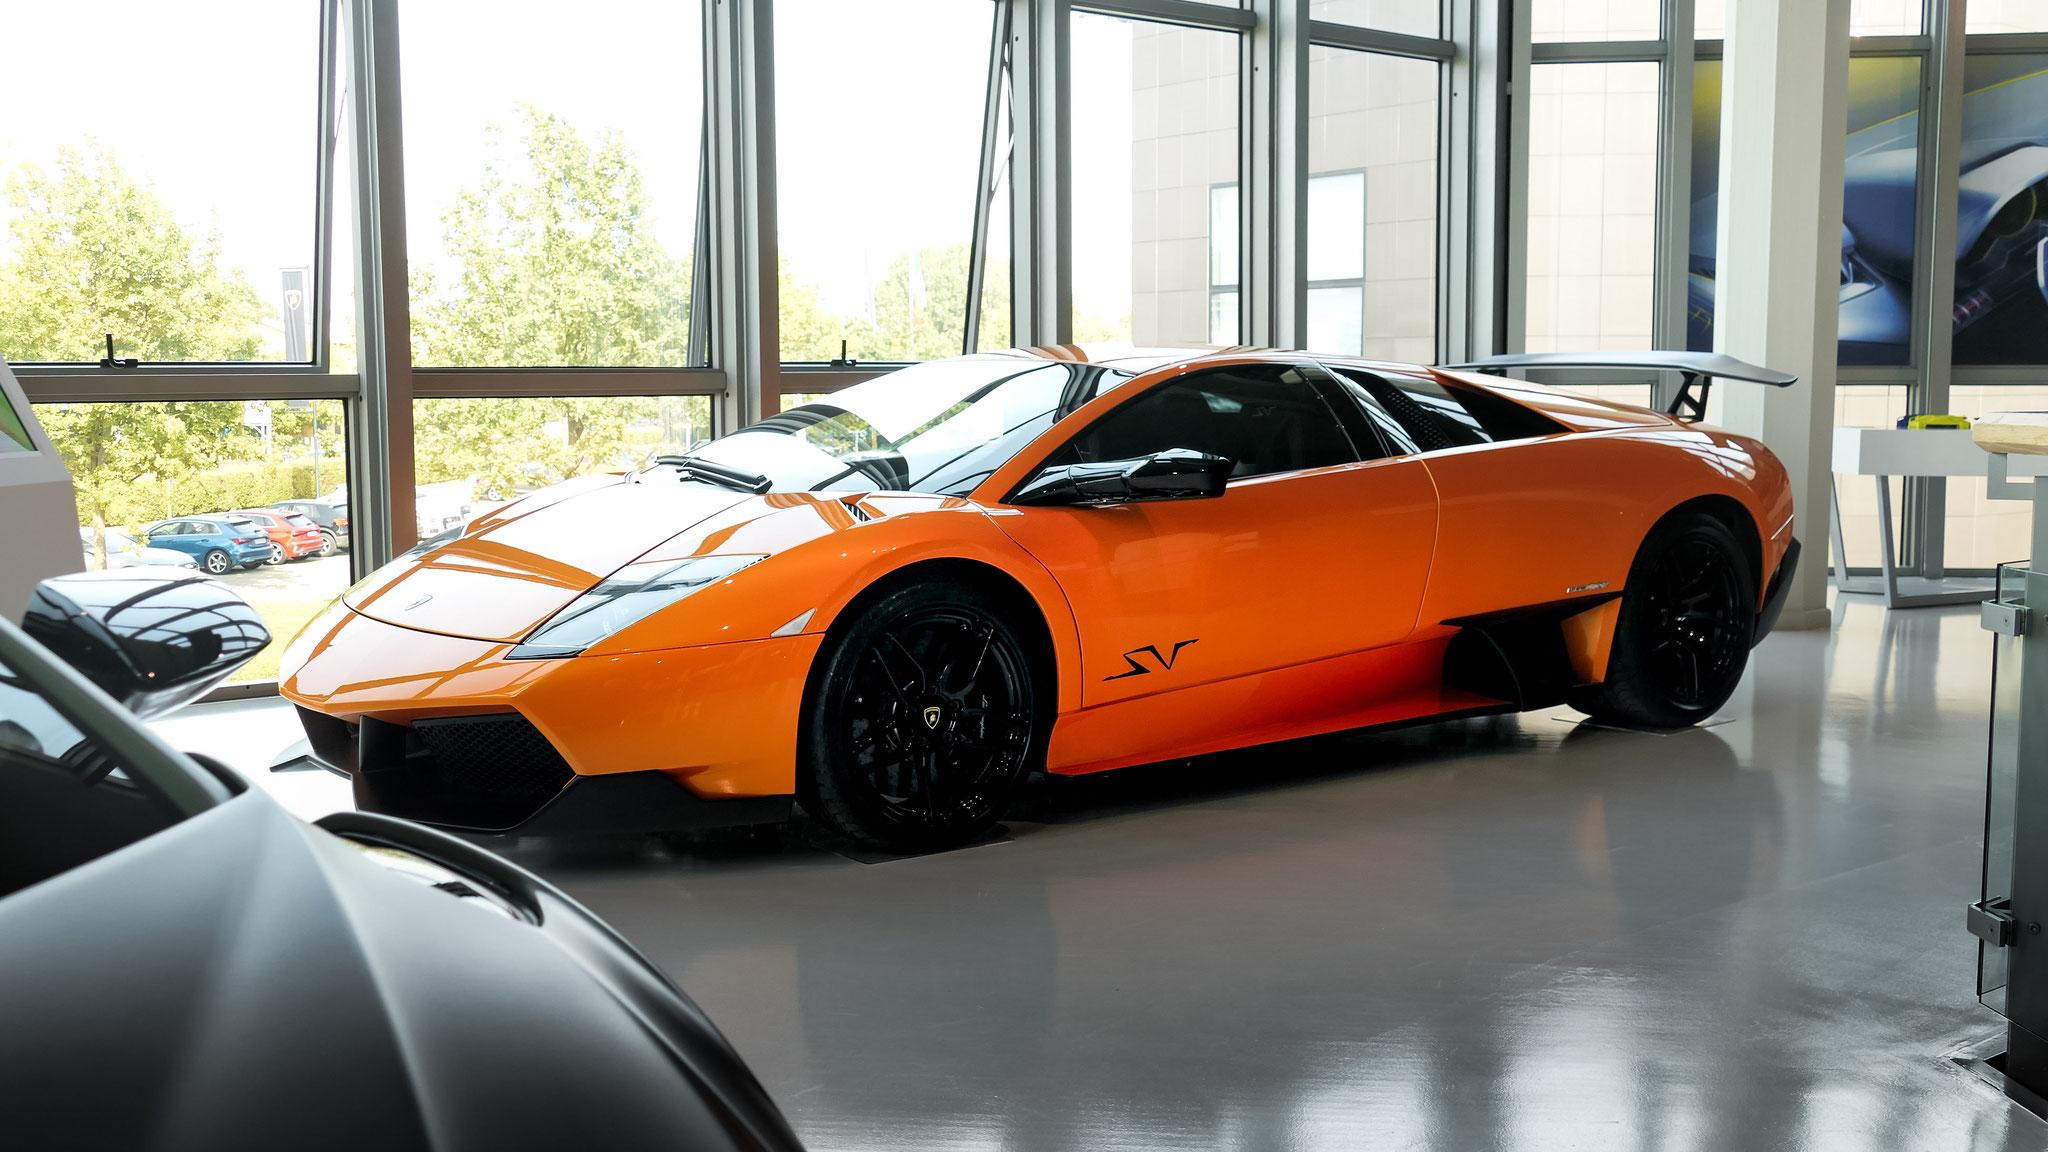 Lamborghini Murcielago SV (Lamborghini Museum)